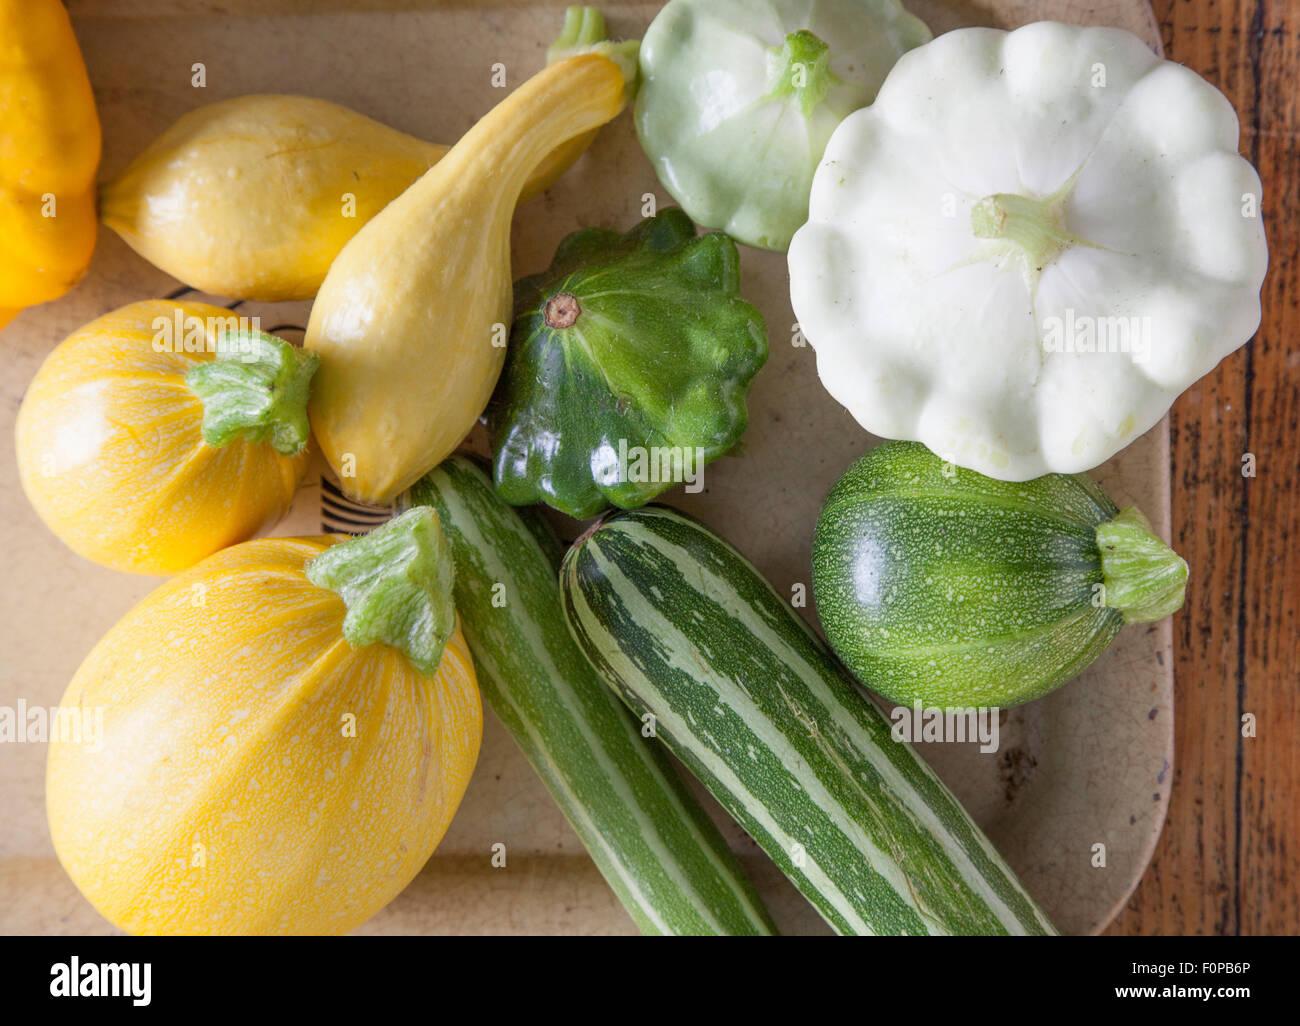 Farm Fresh summer squash Photo Stock